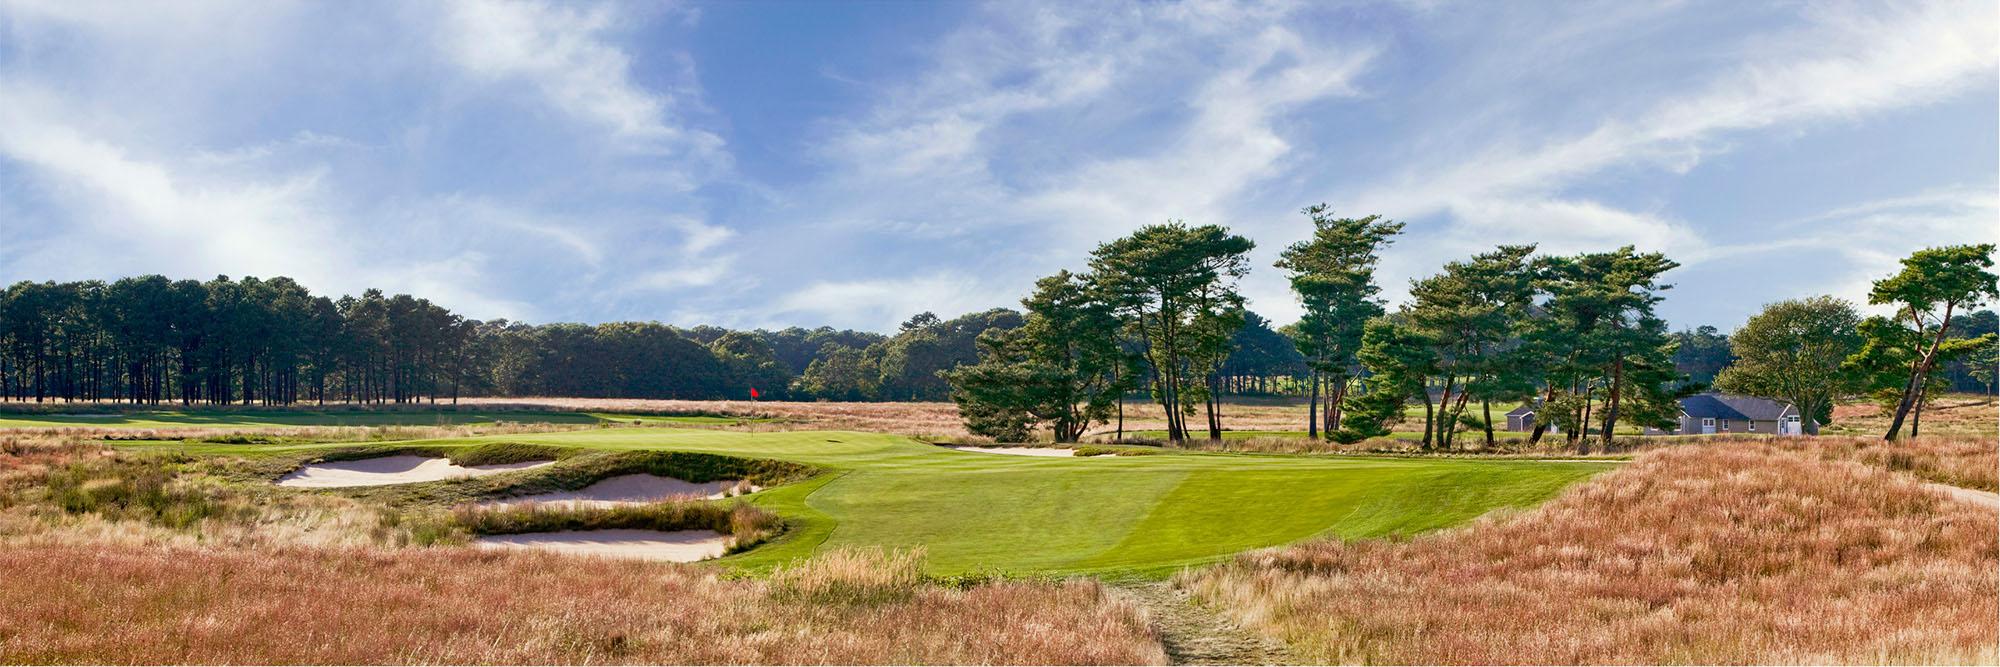 Golf Course Image - Shinnecock Hills Golf Club No. 17